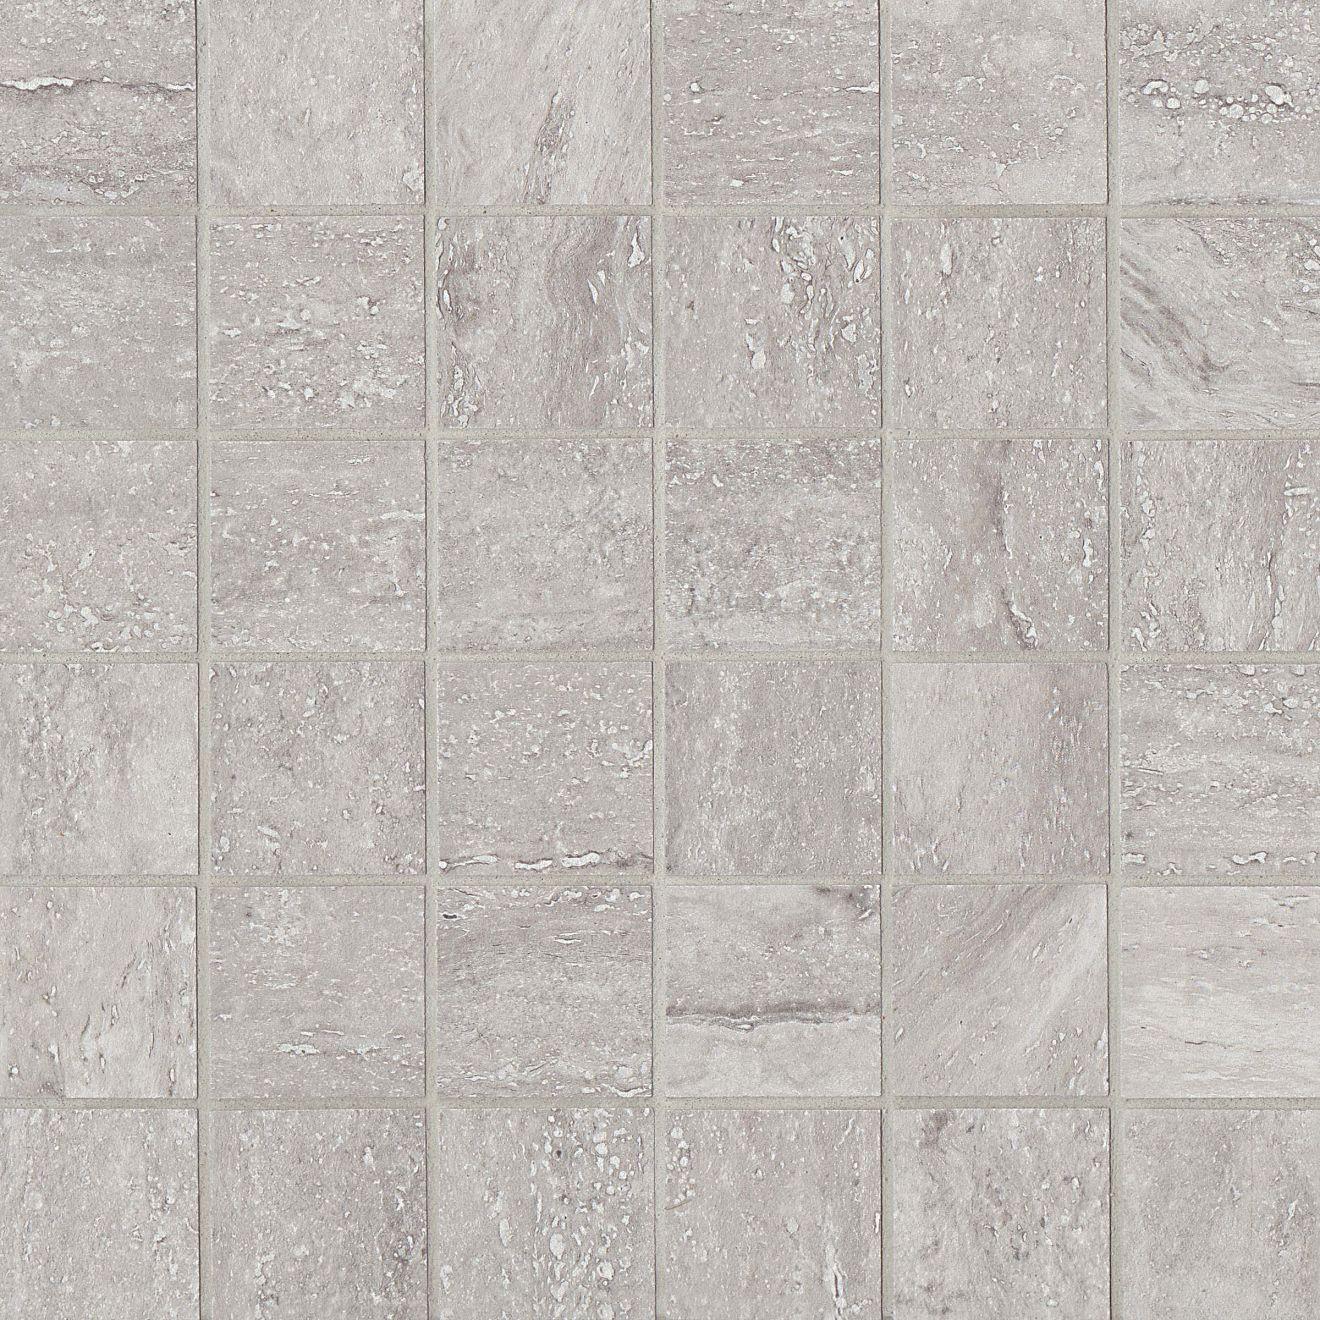 "Toscano 2"" x 2"" Floor & Wall Mosaic in Grigio"